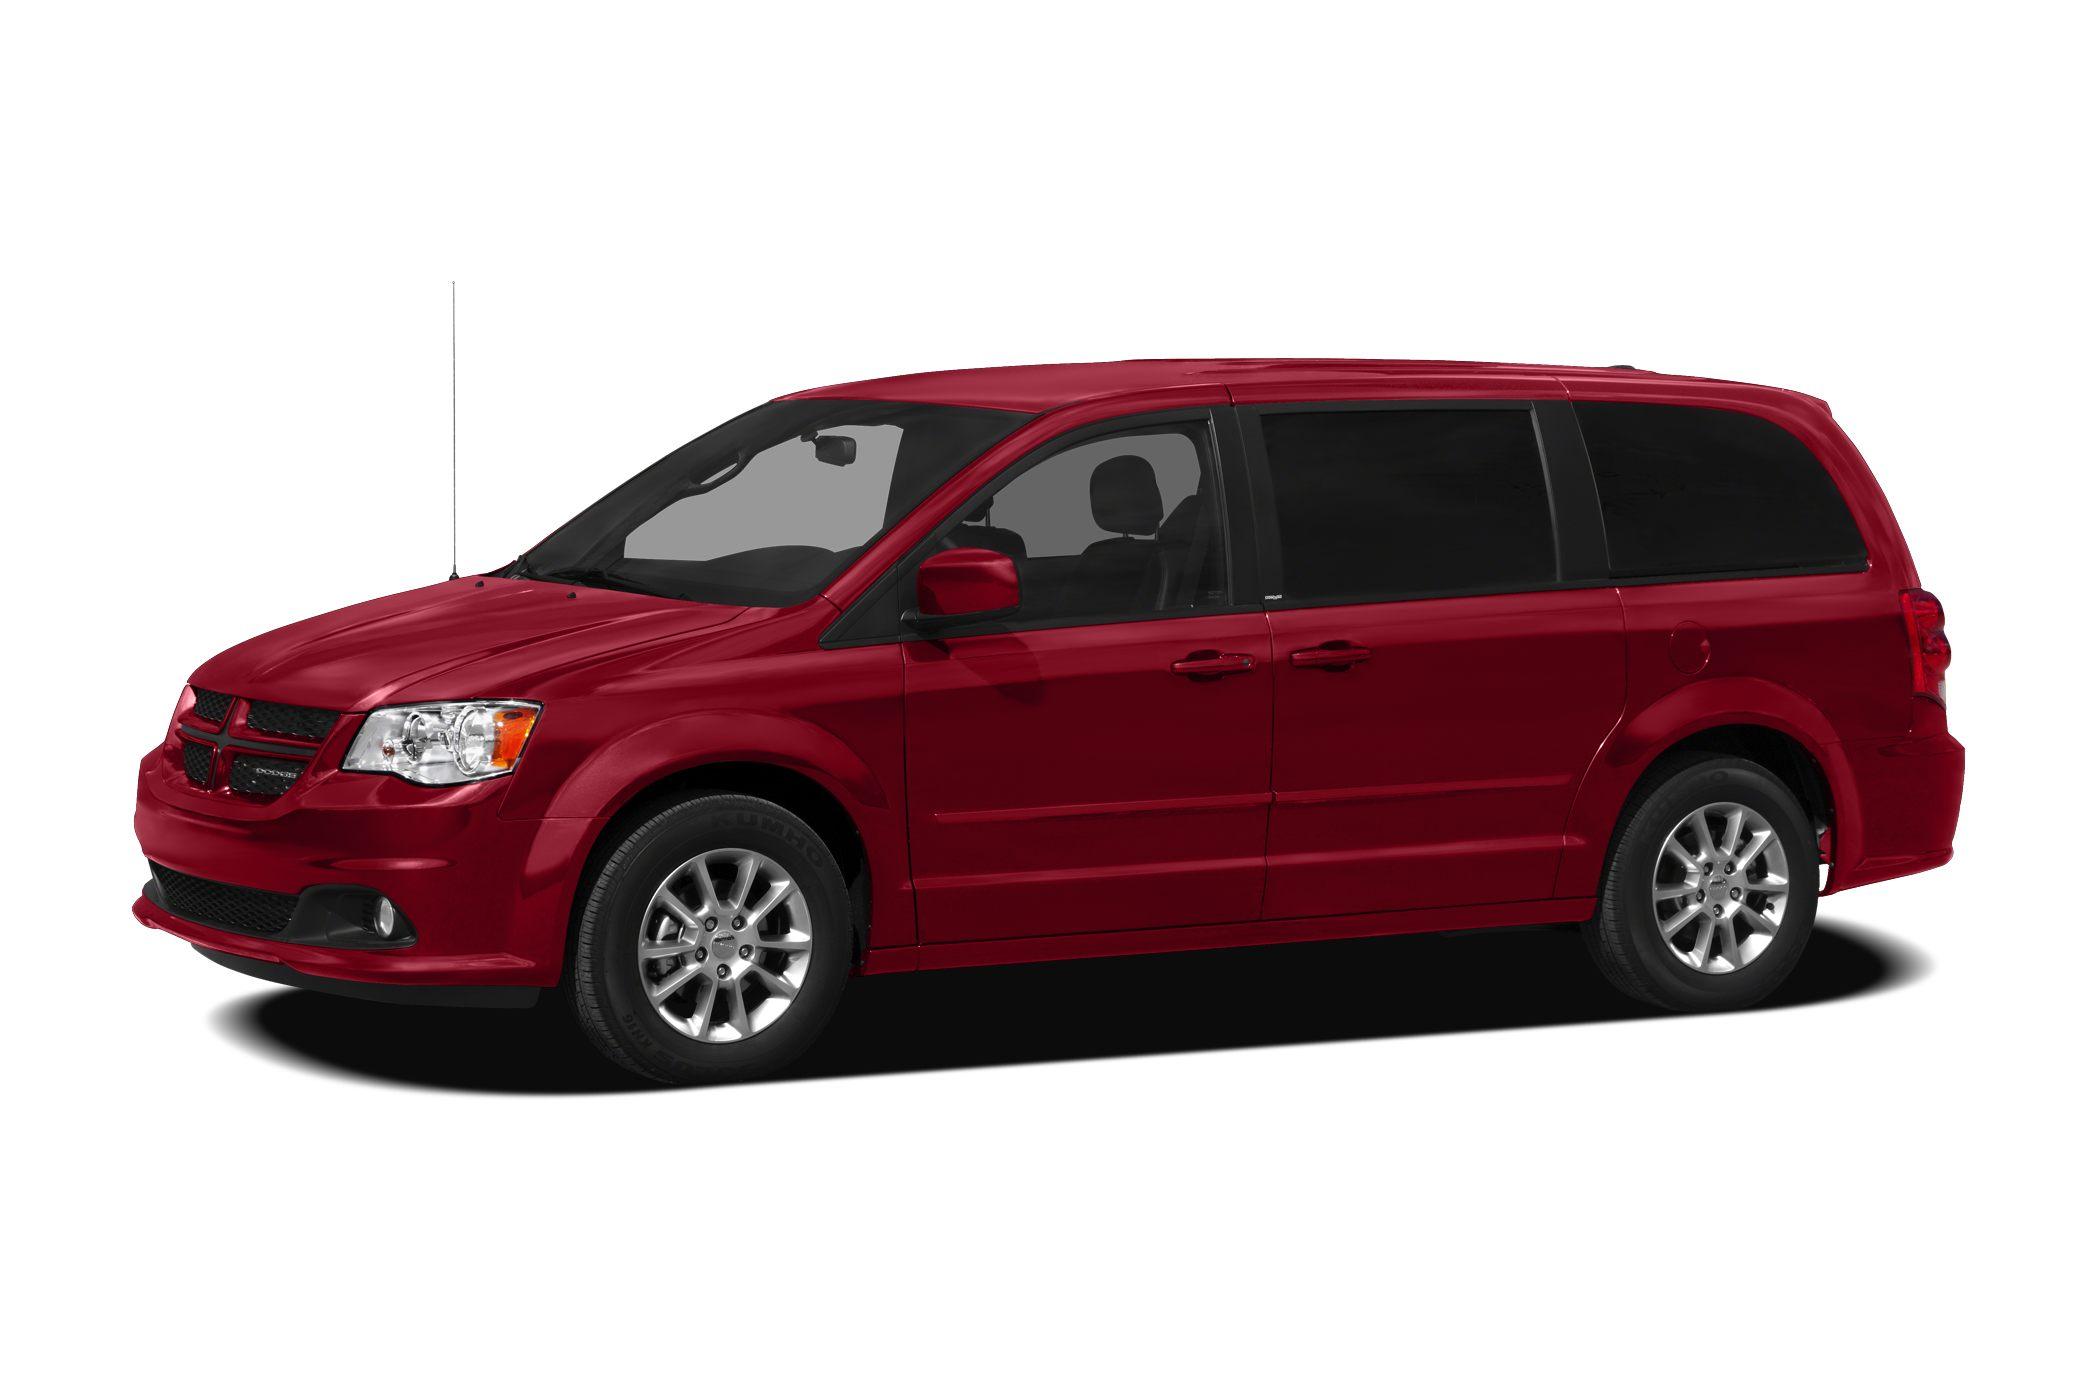 2012 Dodge Grand Caravan R/T Minivan for sale in Staunton for $24,000 with 28,089 miles.